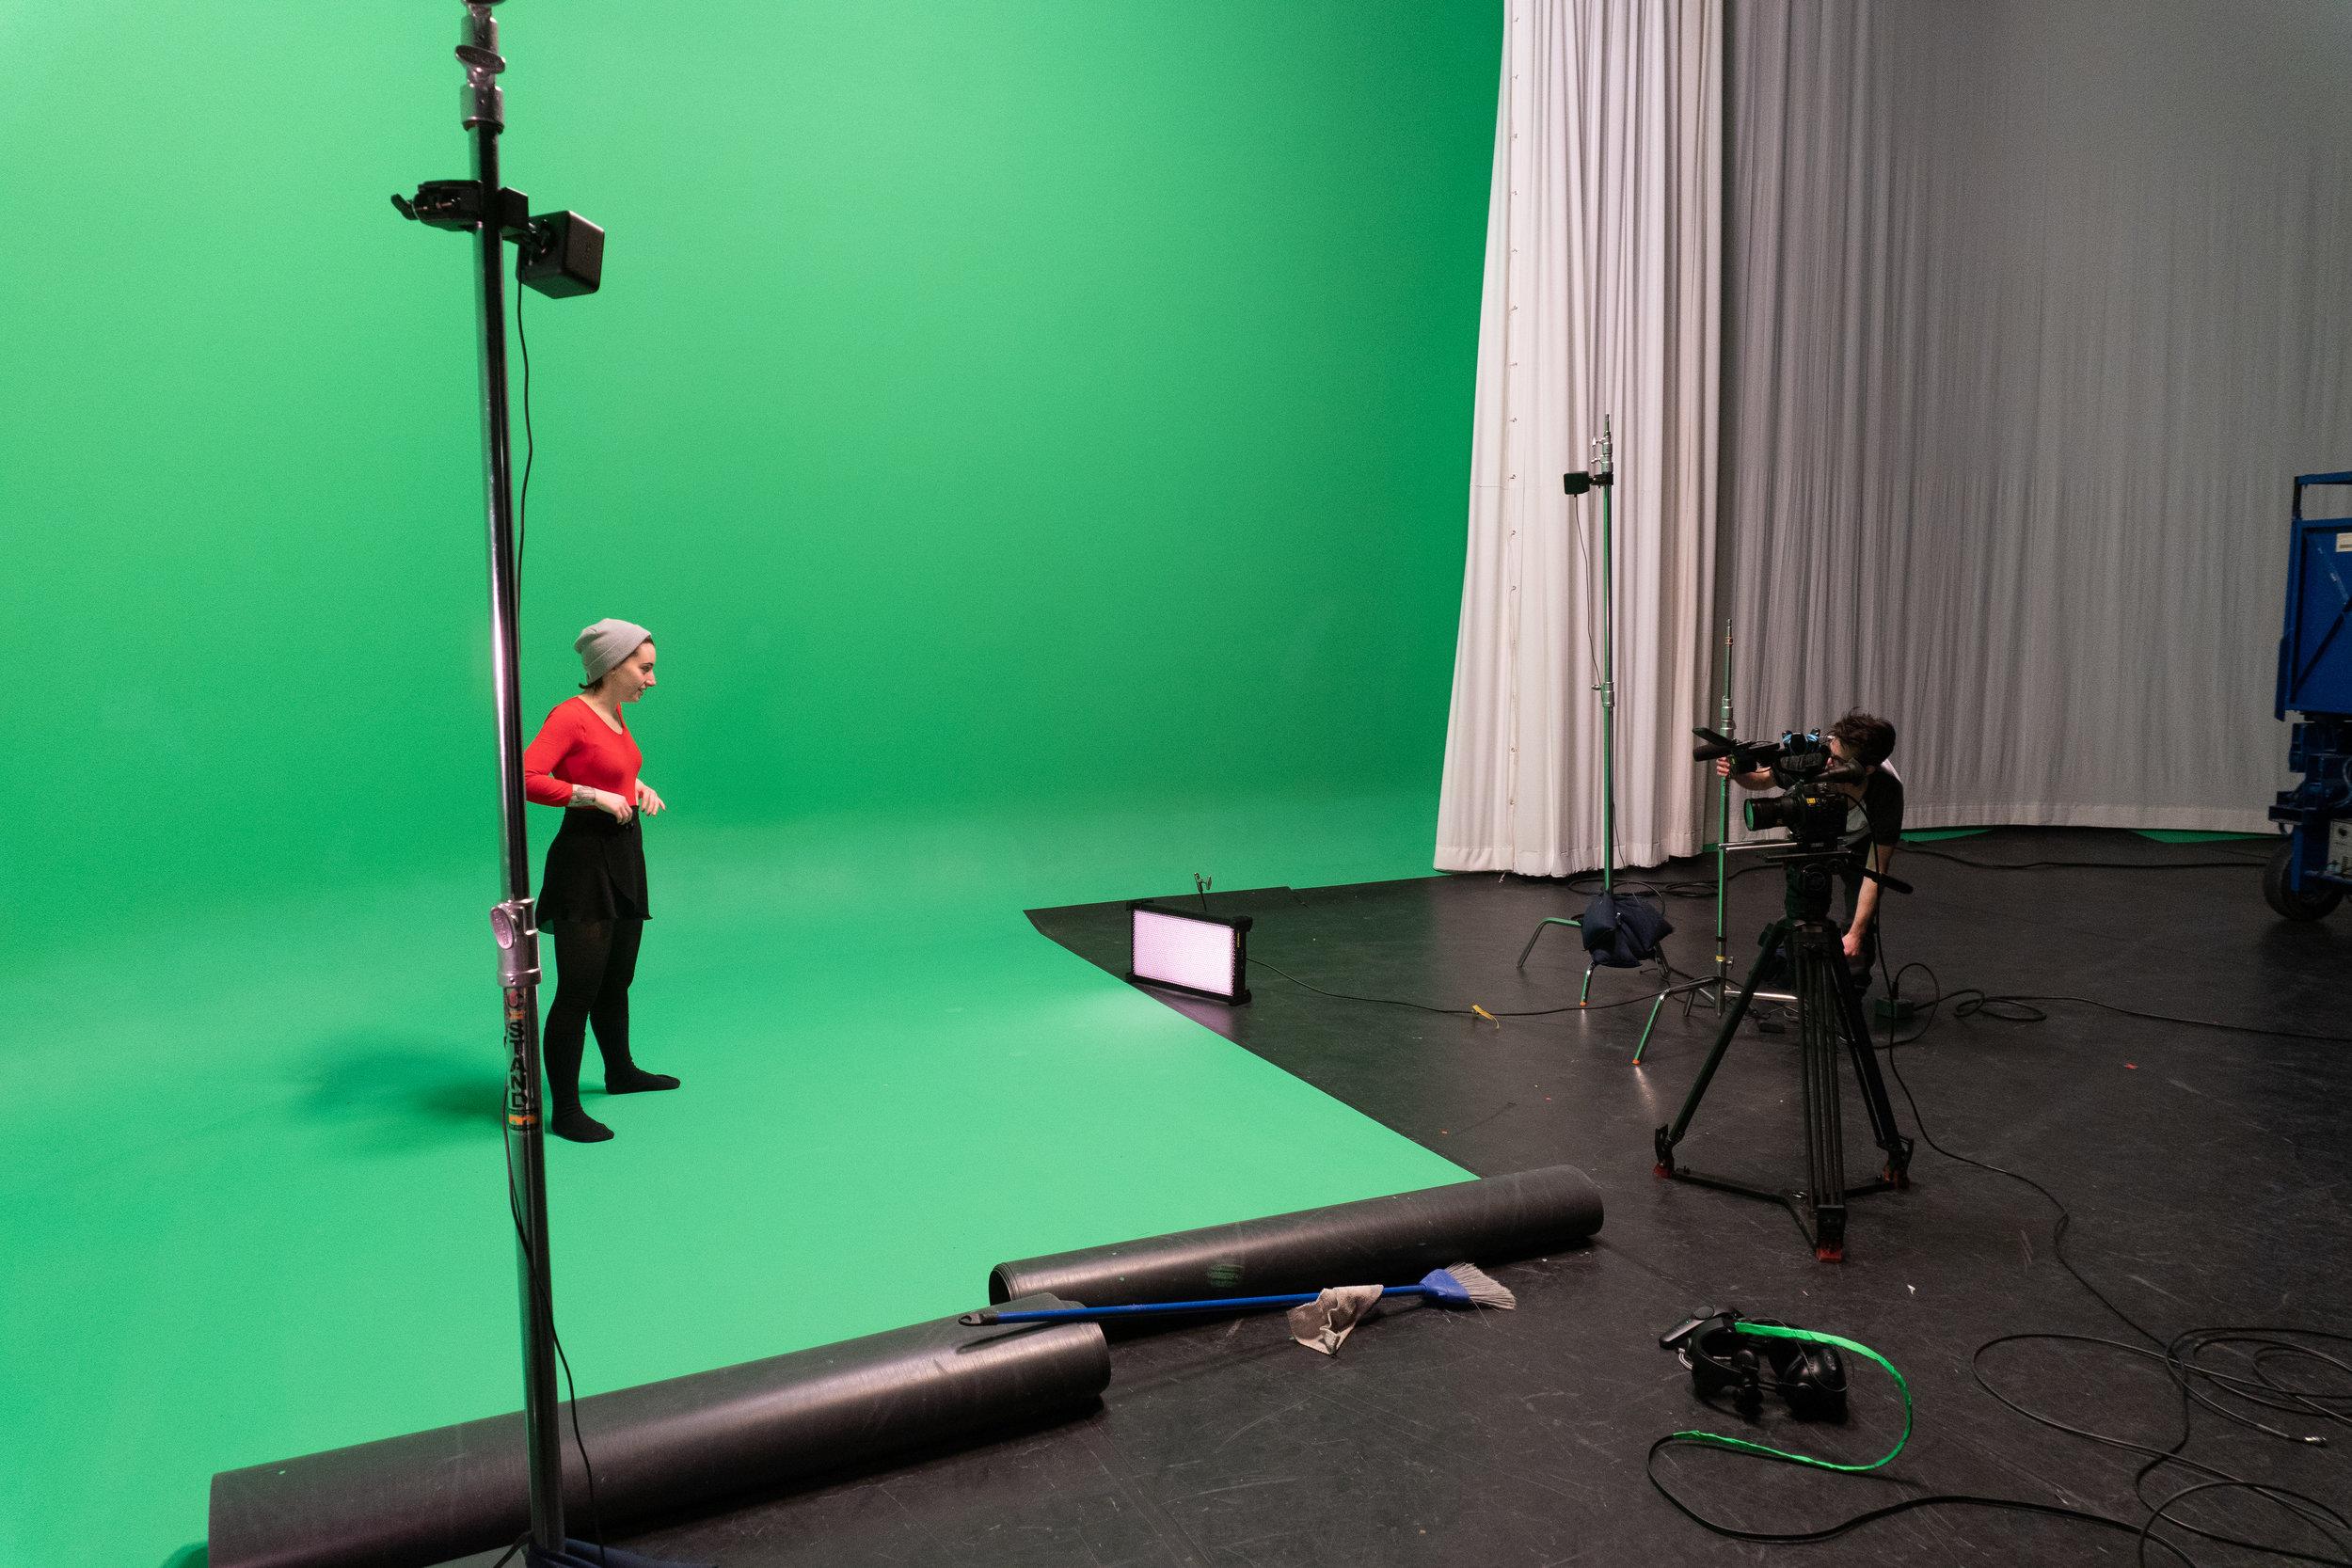 Setup for Final shoot